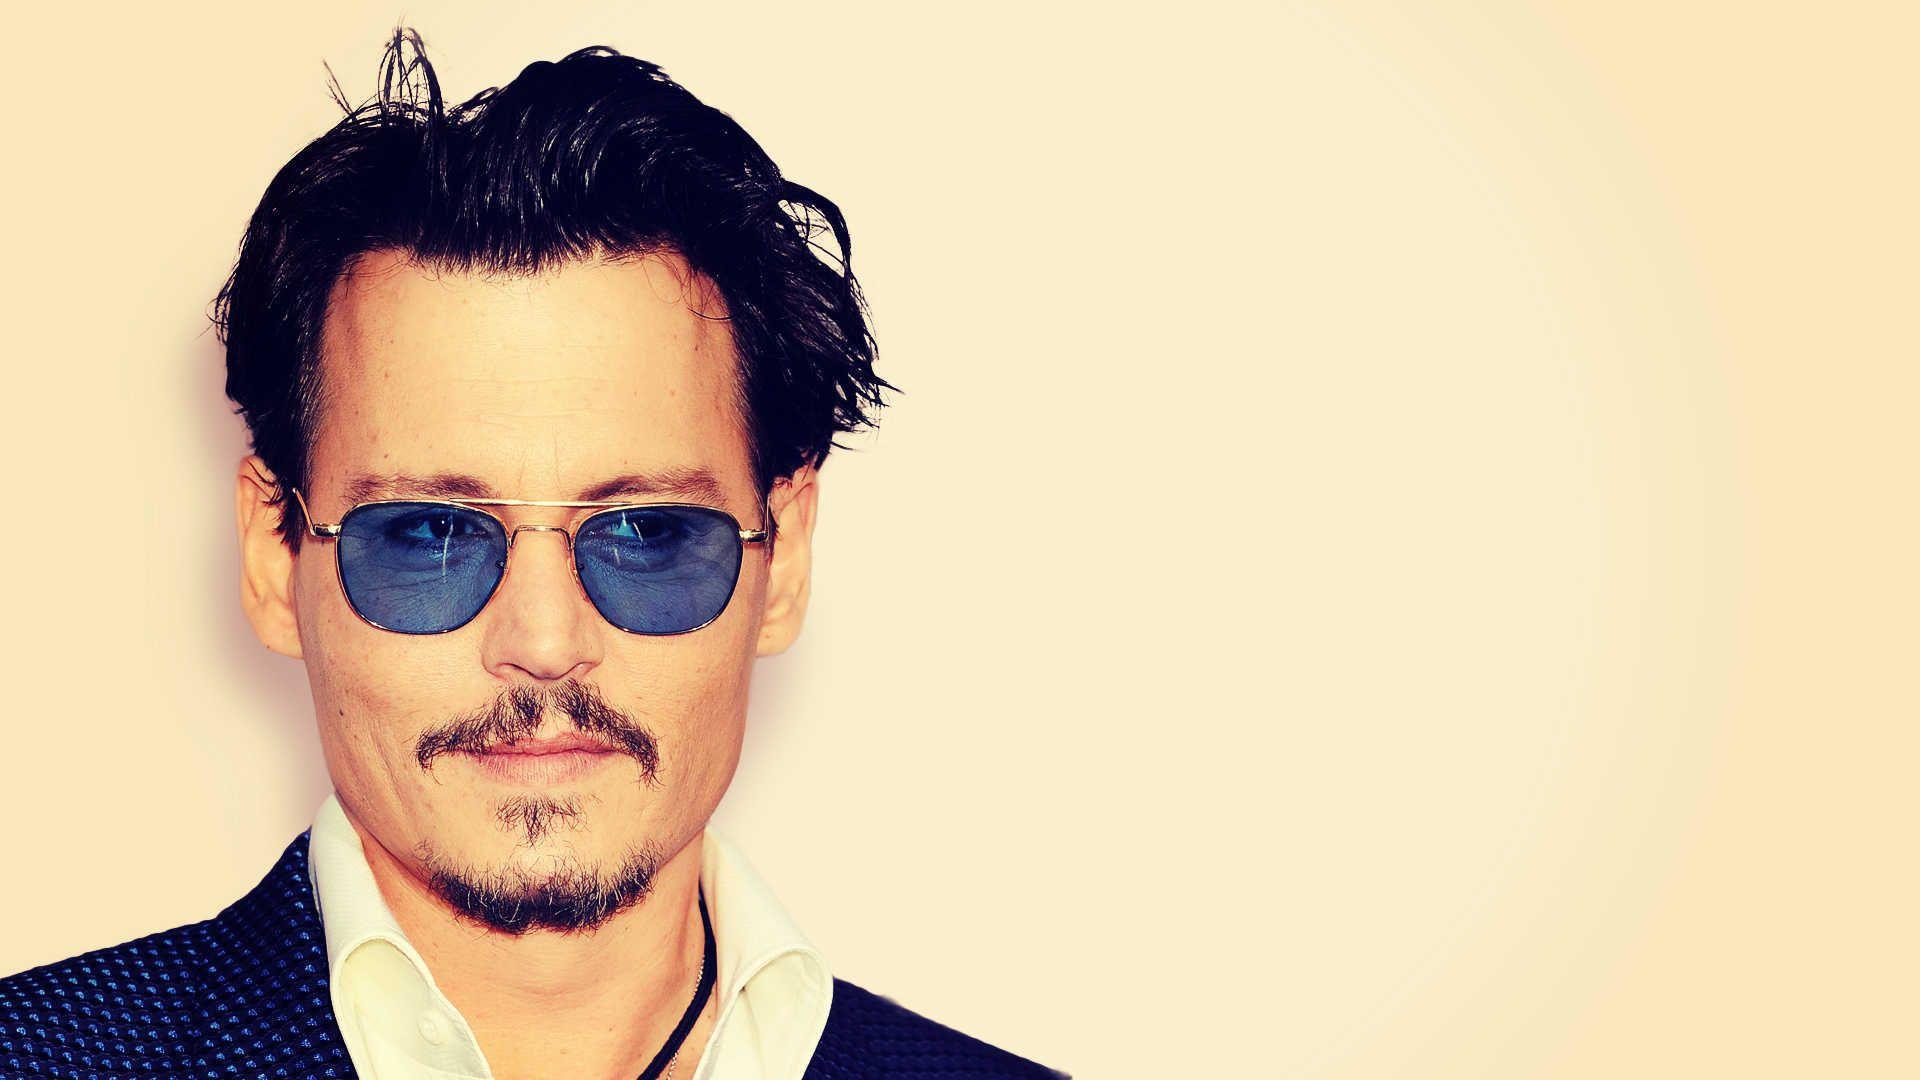 Johnny Depp Free Download